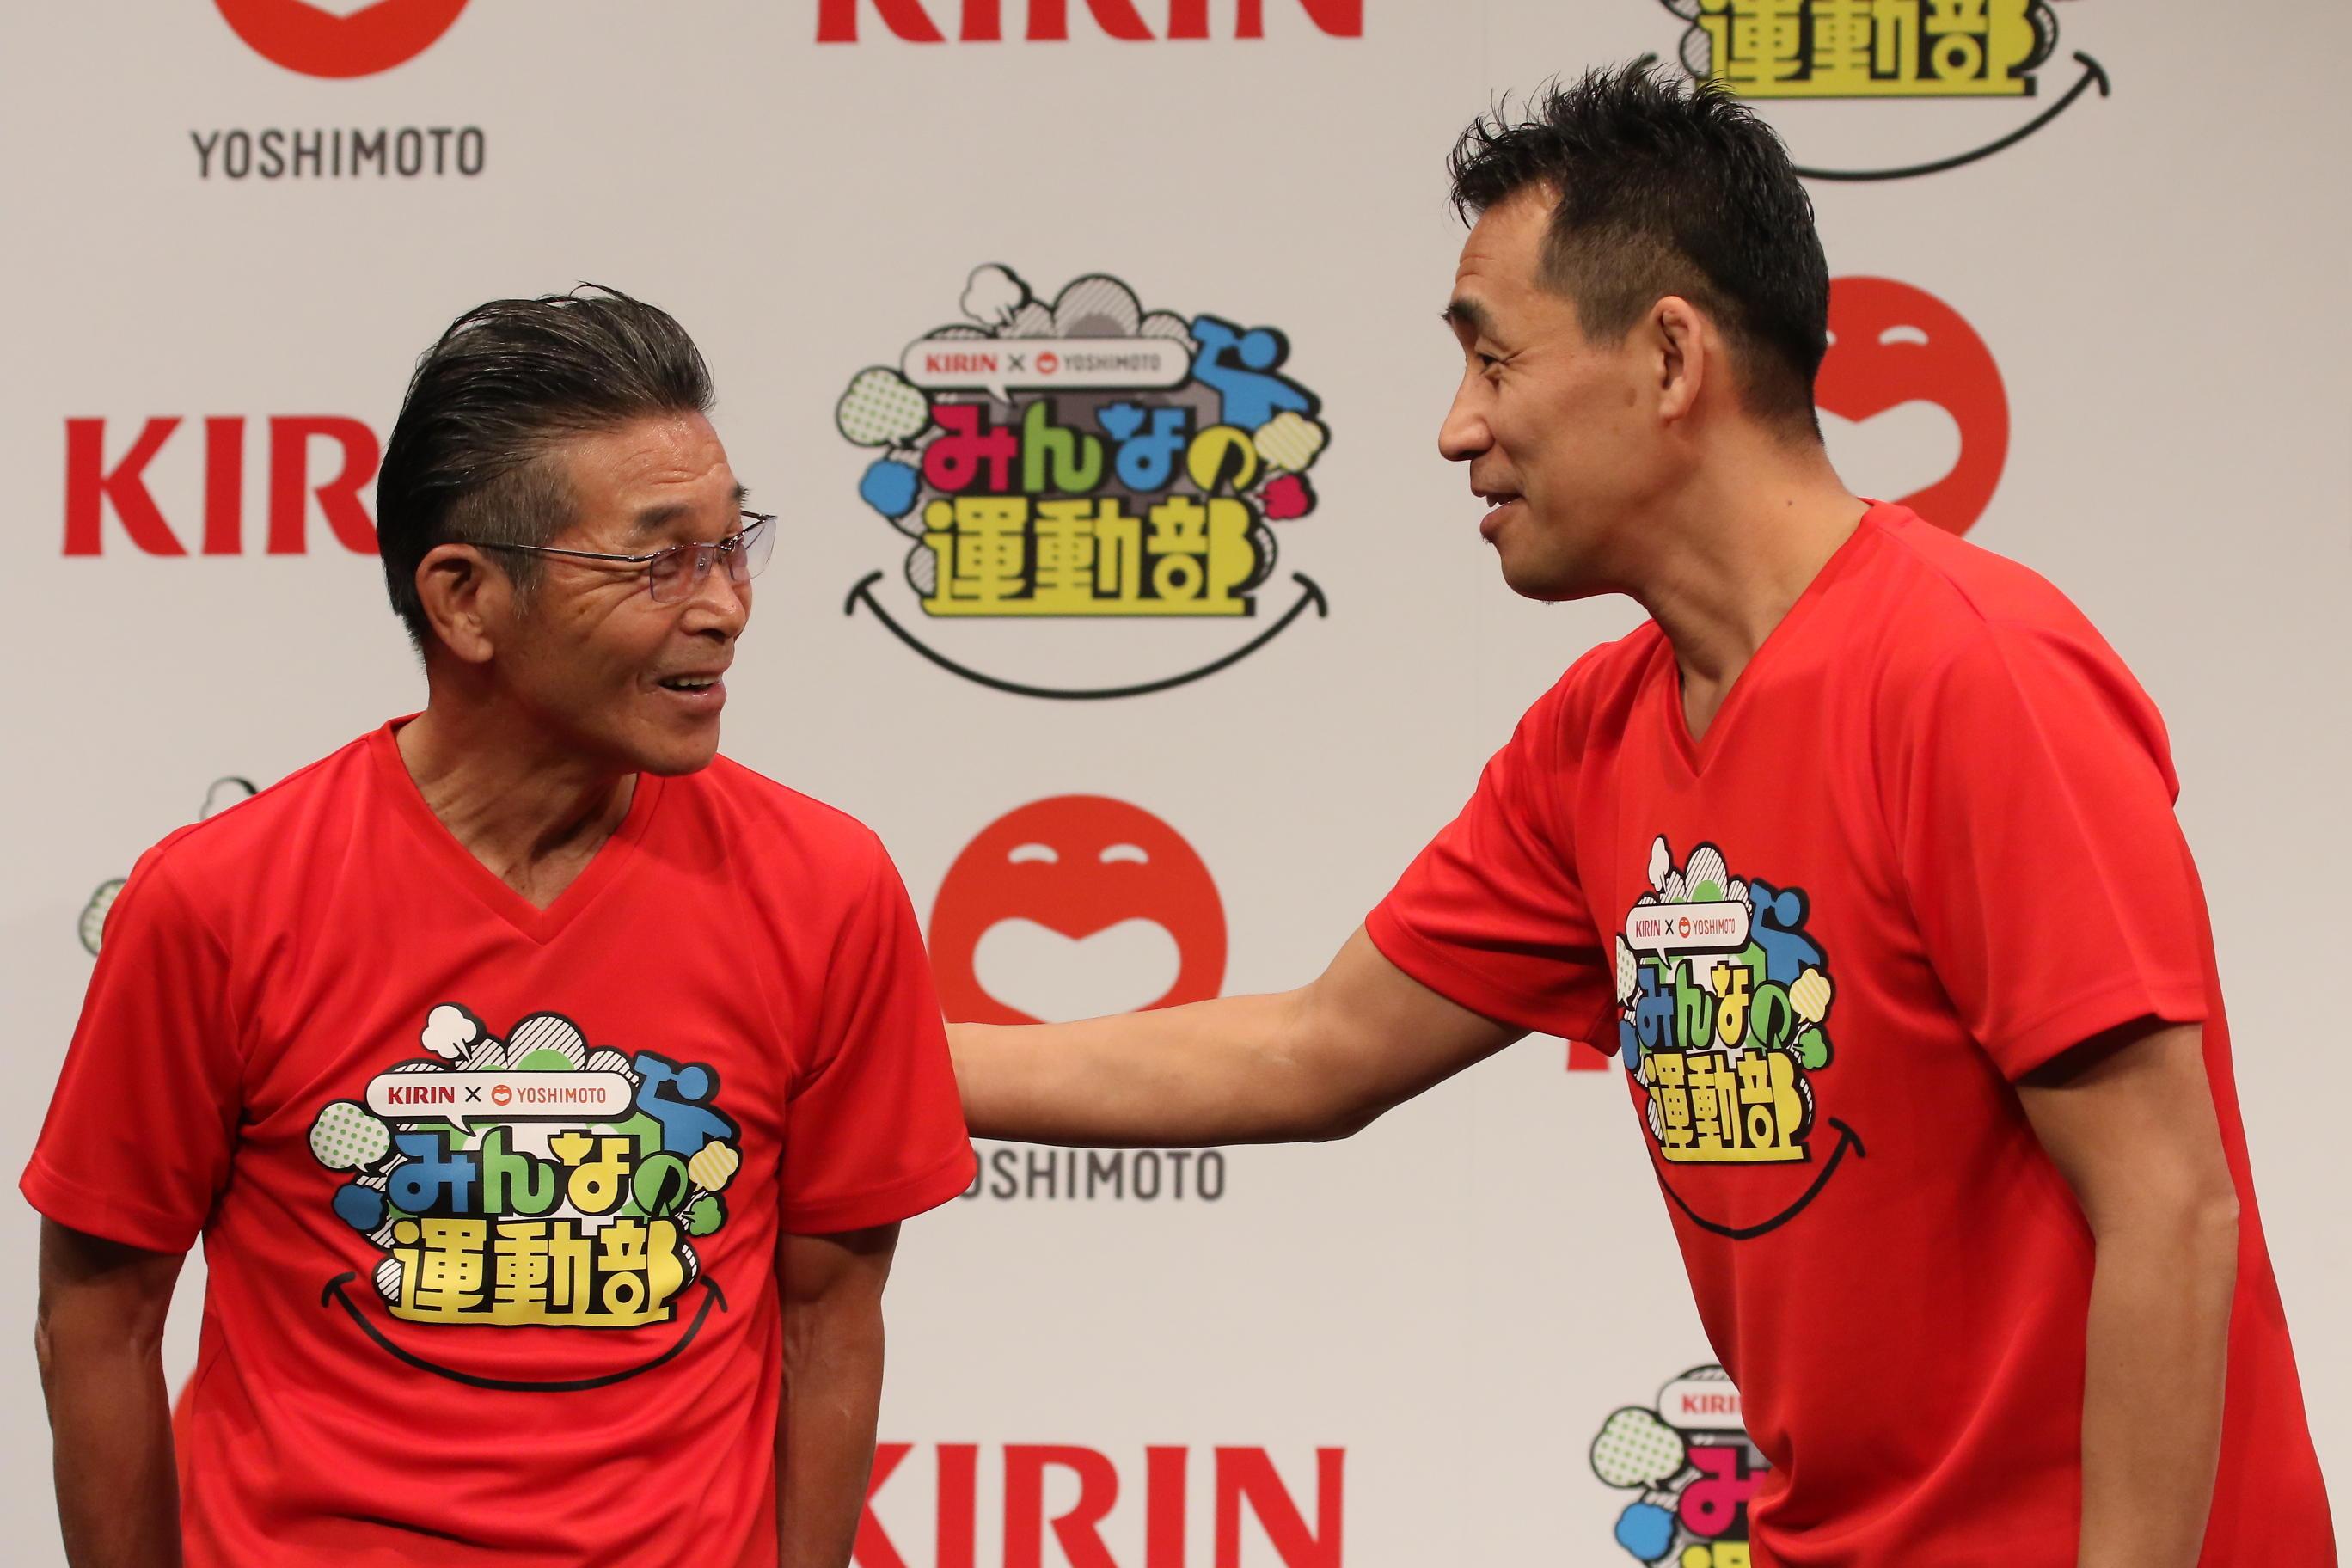 http://news.yoshimoto.co.jp/20190131141218-0071e837ba8f810e7f03bb34a606a15a01fd3efd.jpg